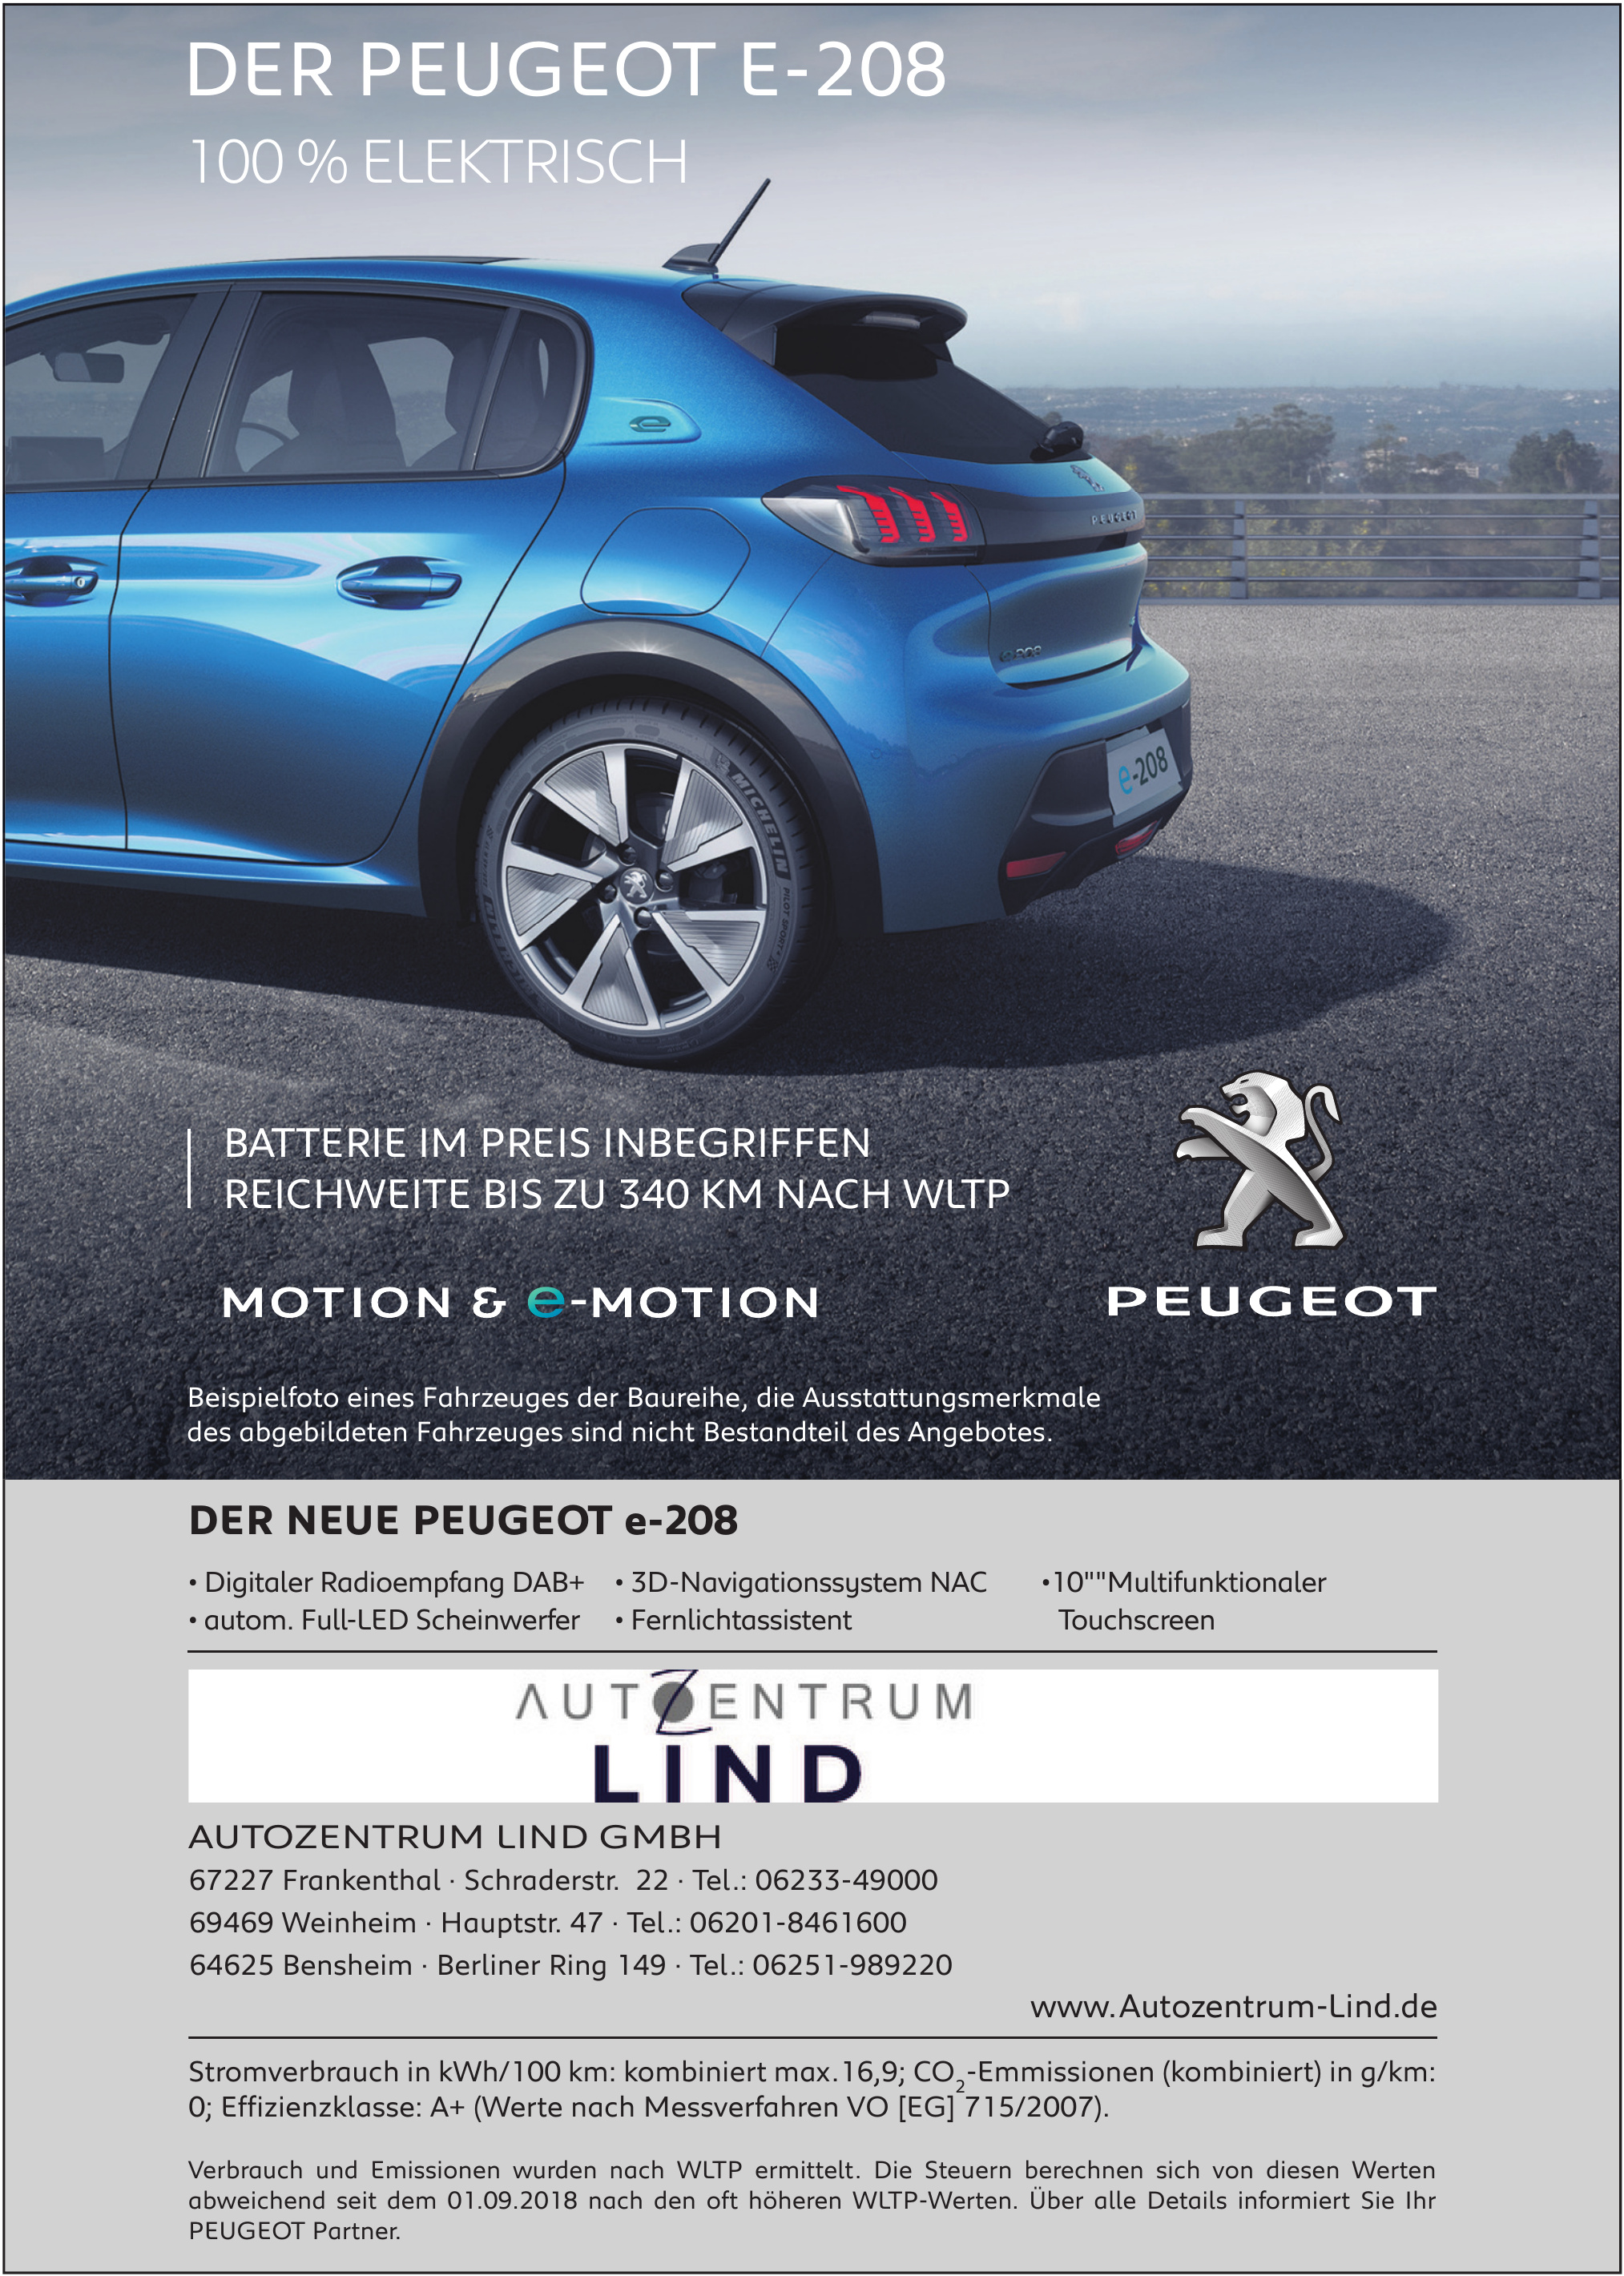 Autozentrum Lind GmbH